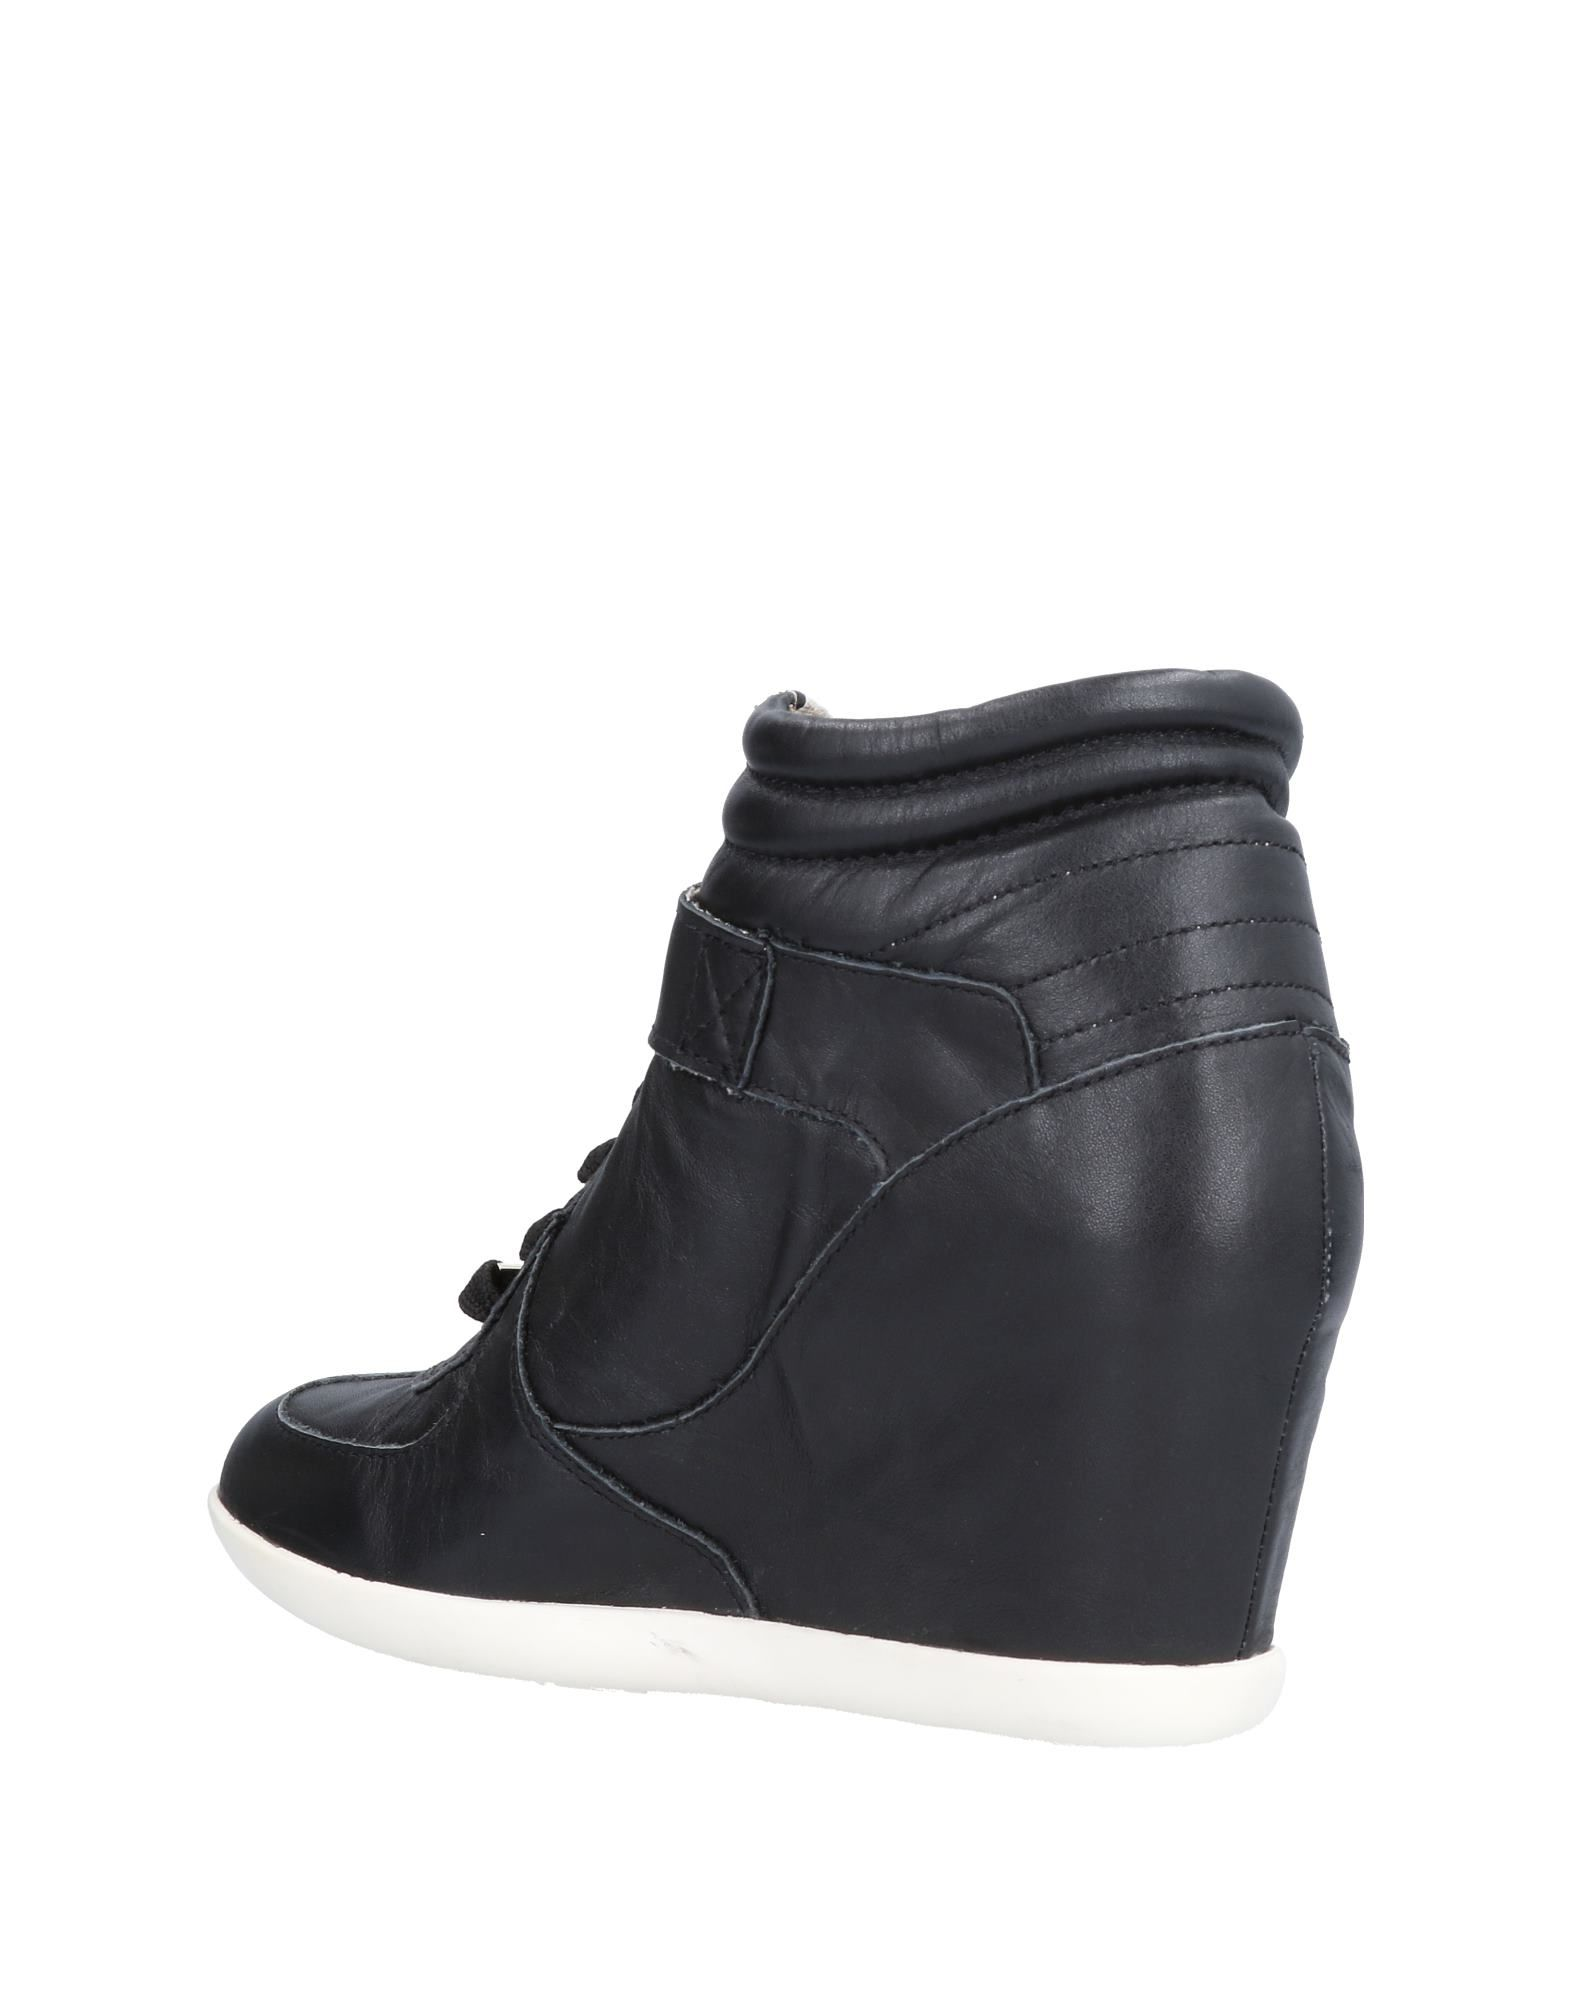 Liu •Jo Shoes Sneakers 11500991PR Damen  11500991PR Sneakers  8a6c90